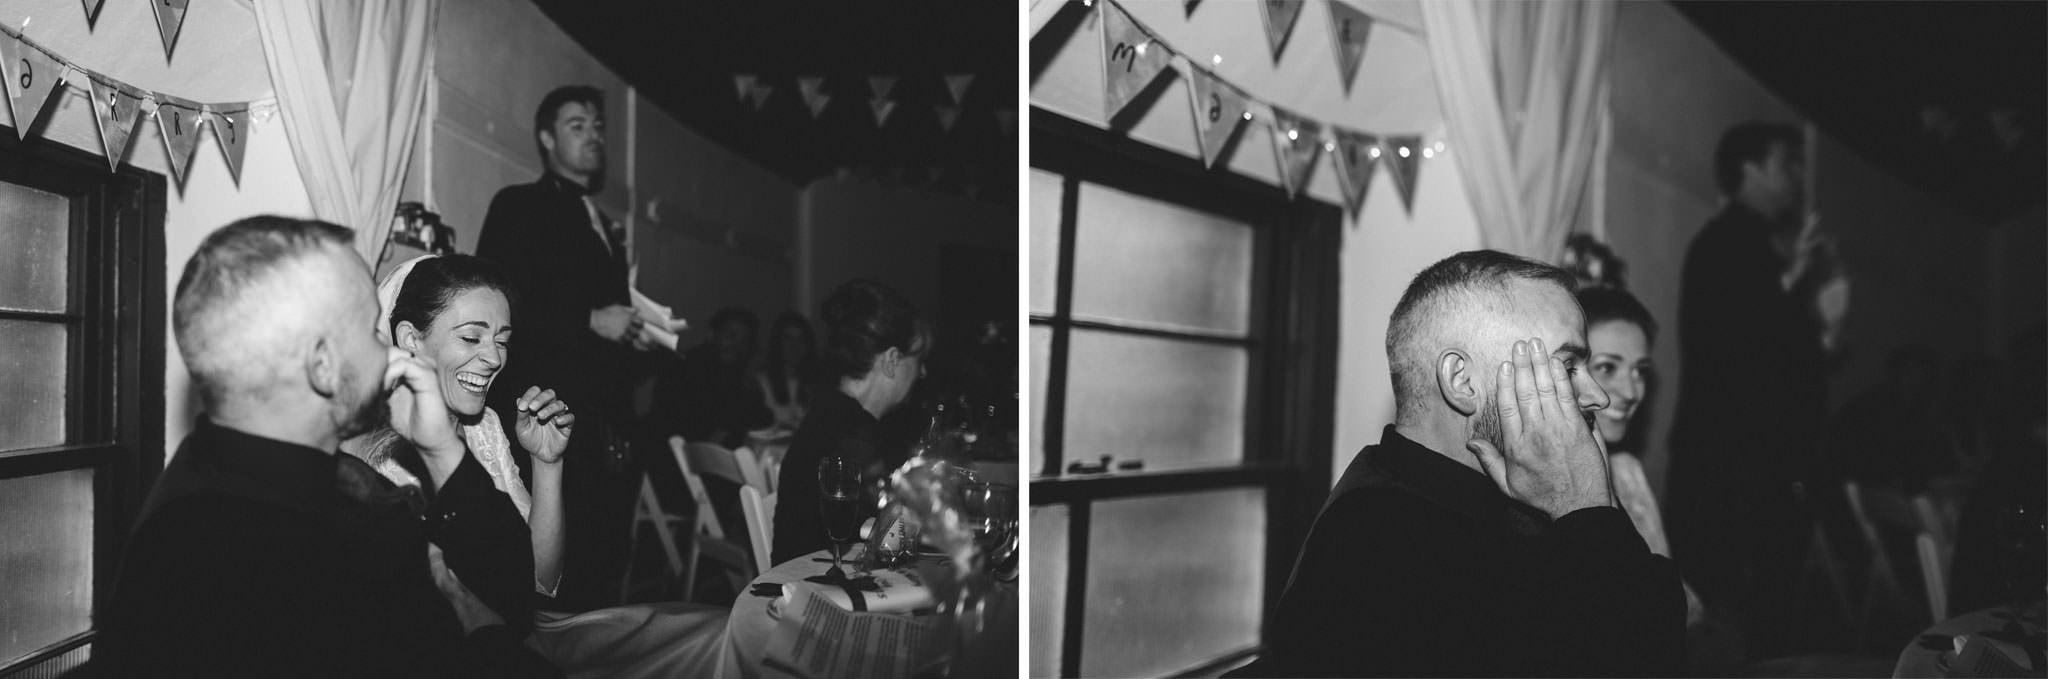 fine-art-wedding-photography-scotland 106